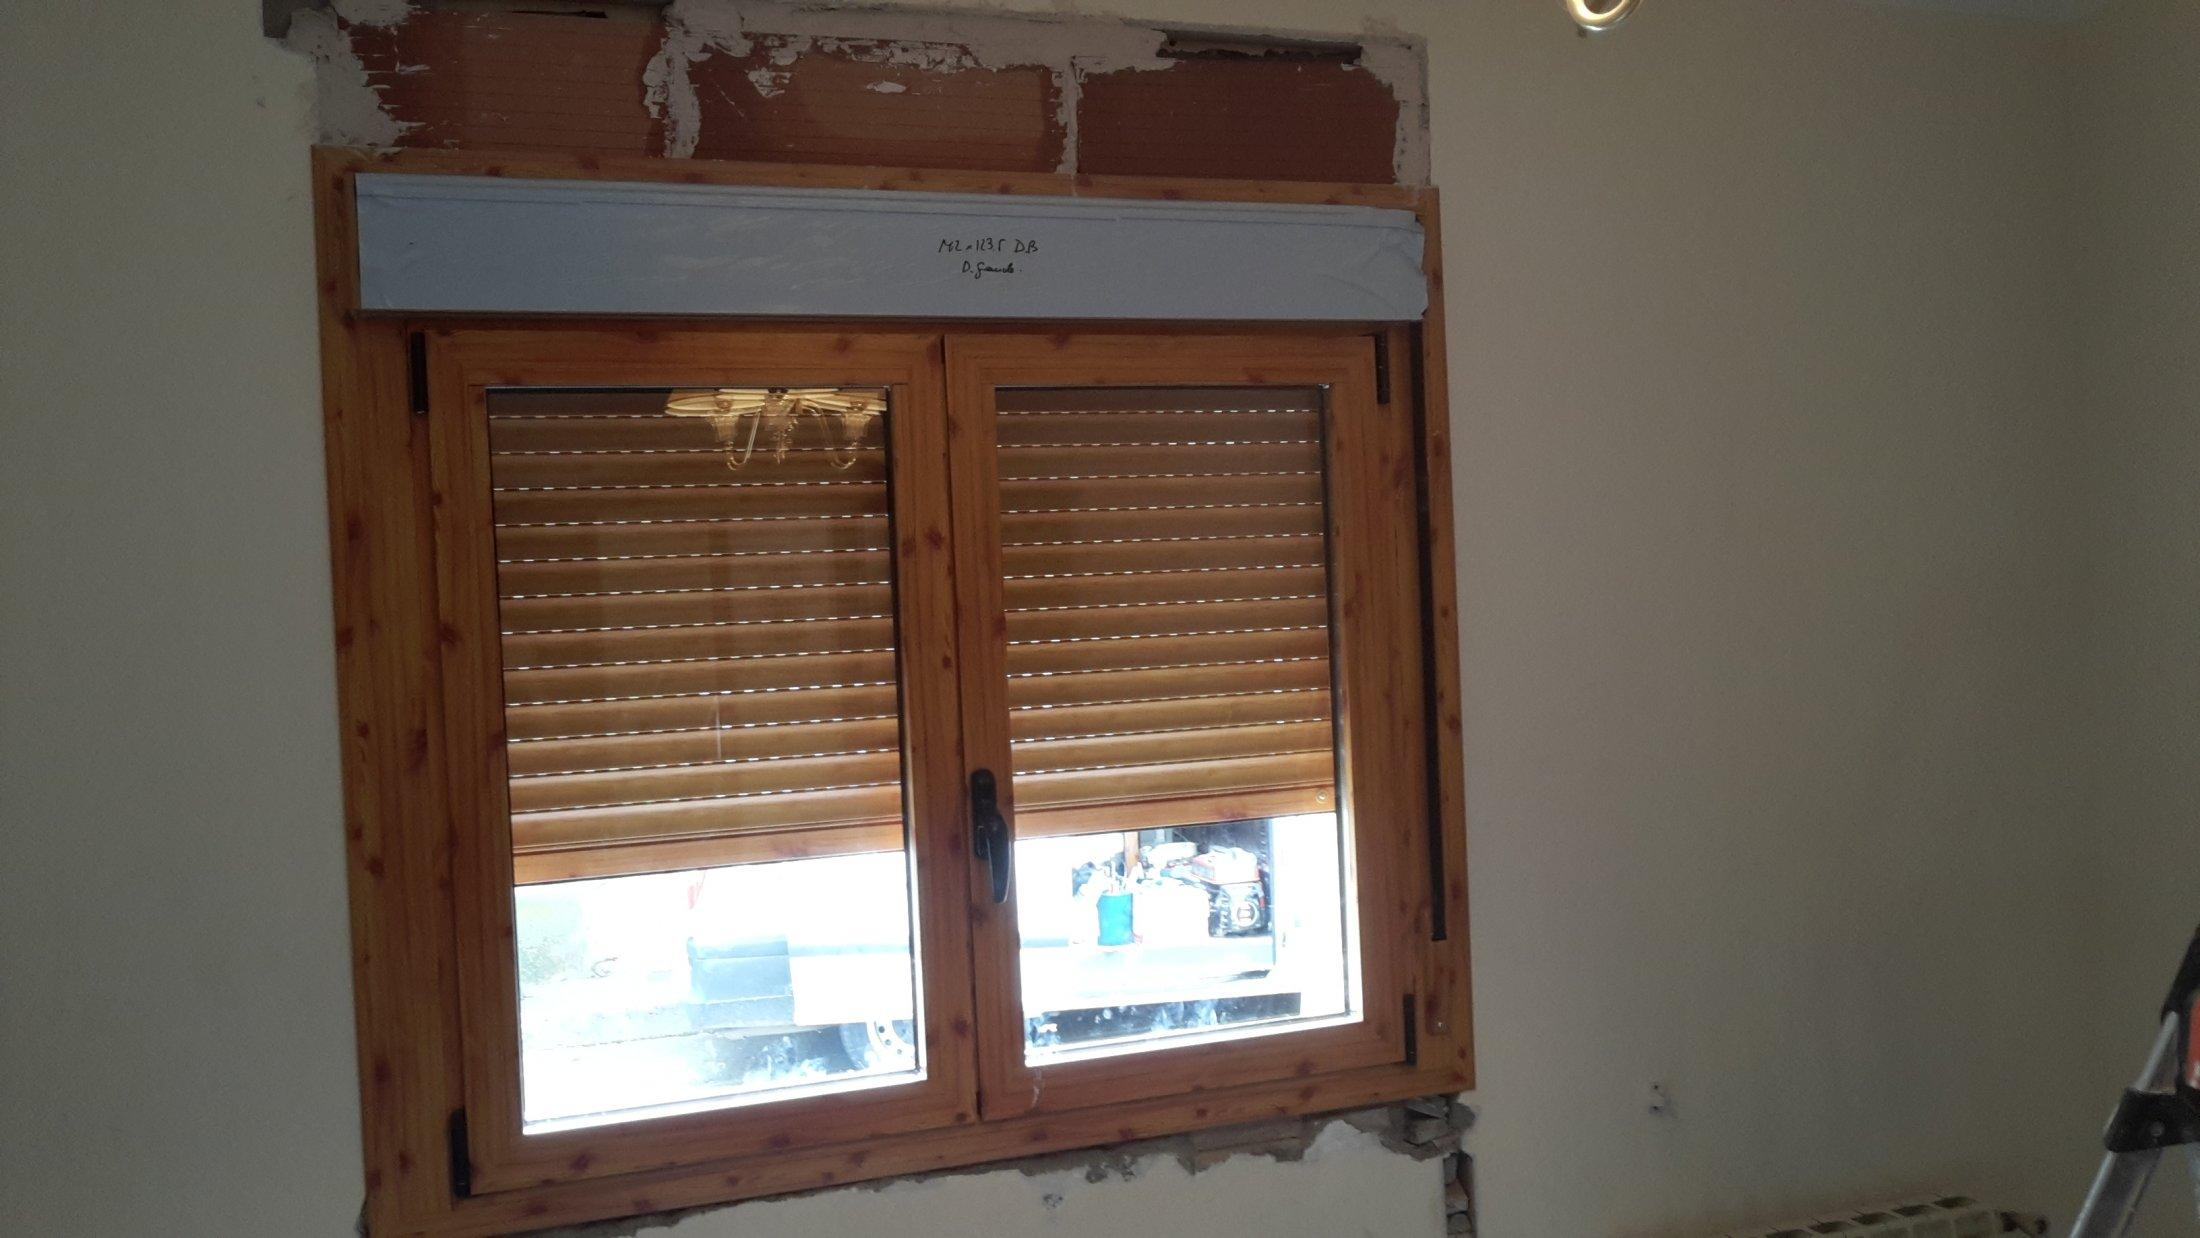 Montaje ventanas de aluminio montajes de aluminio dg for Marcos de ventanas de aluminio